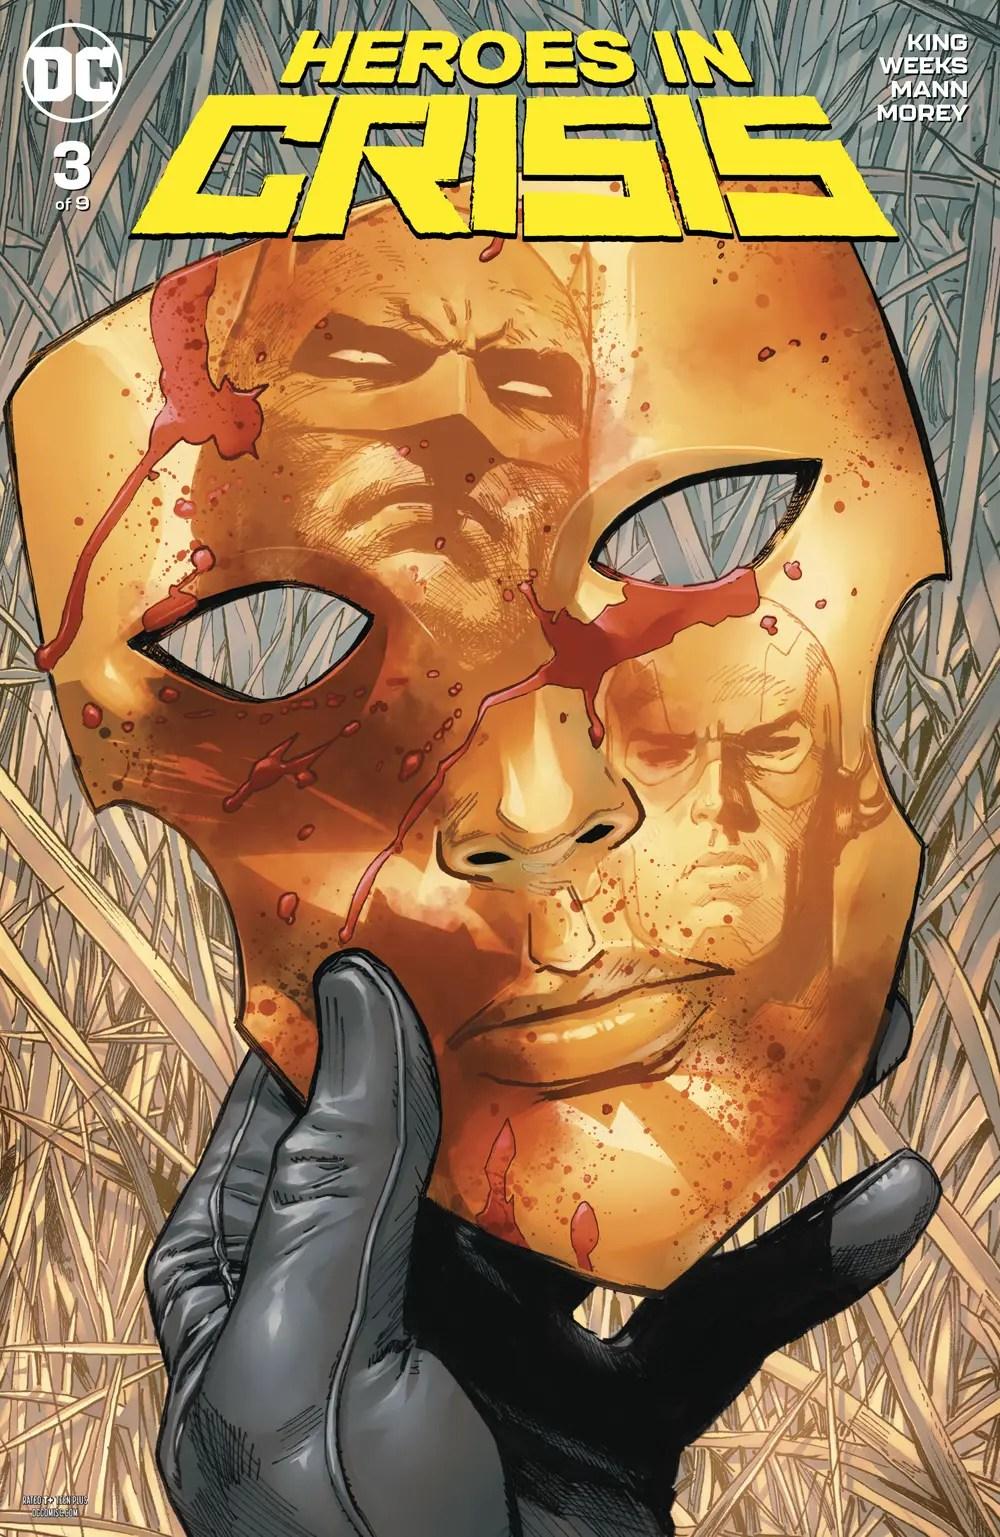 Heroes In Crisis #3 review: Laser-focused